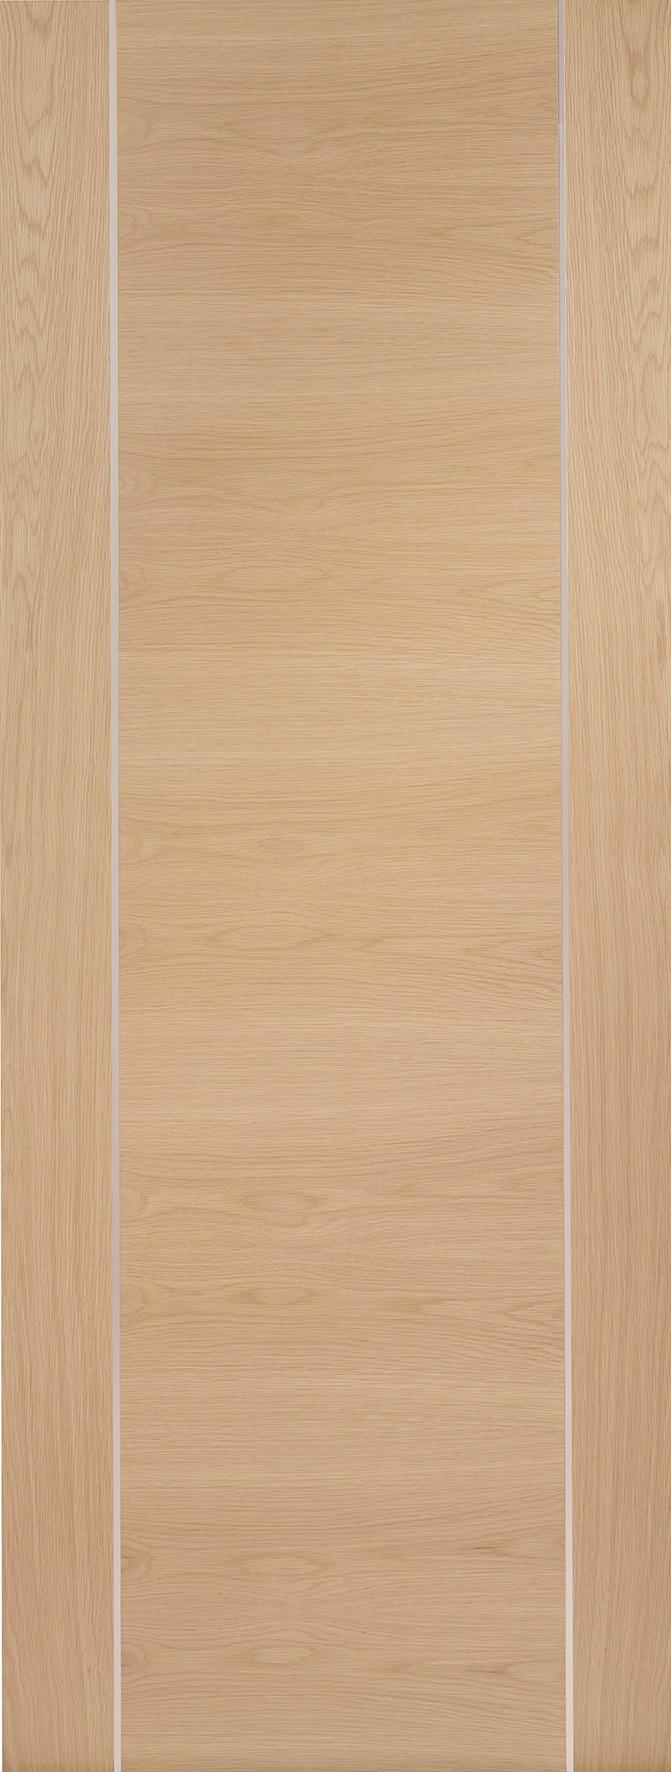 XL JOINERY DOORS -  PFINTOFOR33  Internal Oak Pre-Finished Forli (Alum Inlay)  PFINTOFOR33